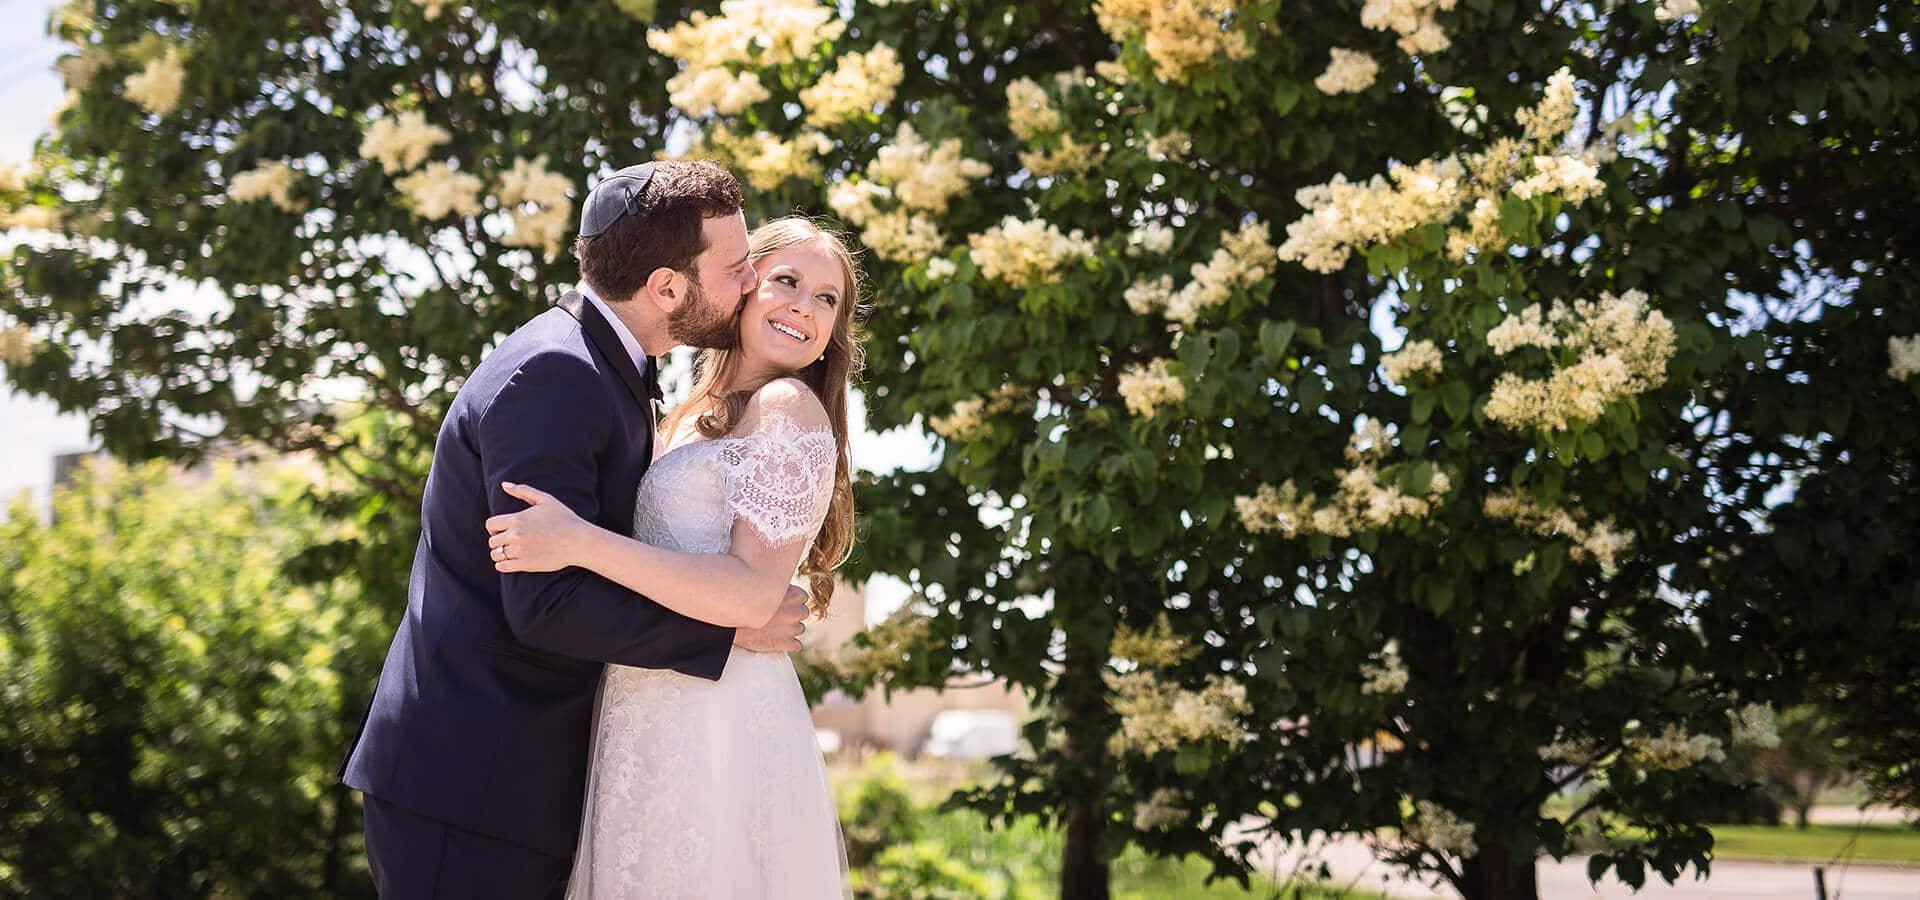 Hero image for Samara & Eli's Classically Elegant Wedding at Bellvue Manor